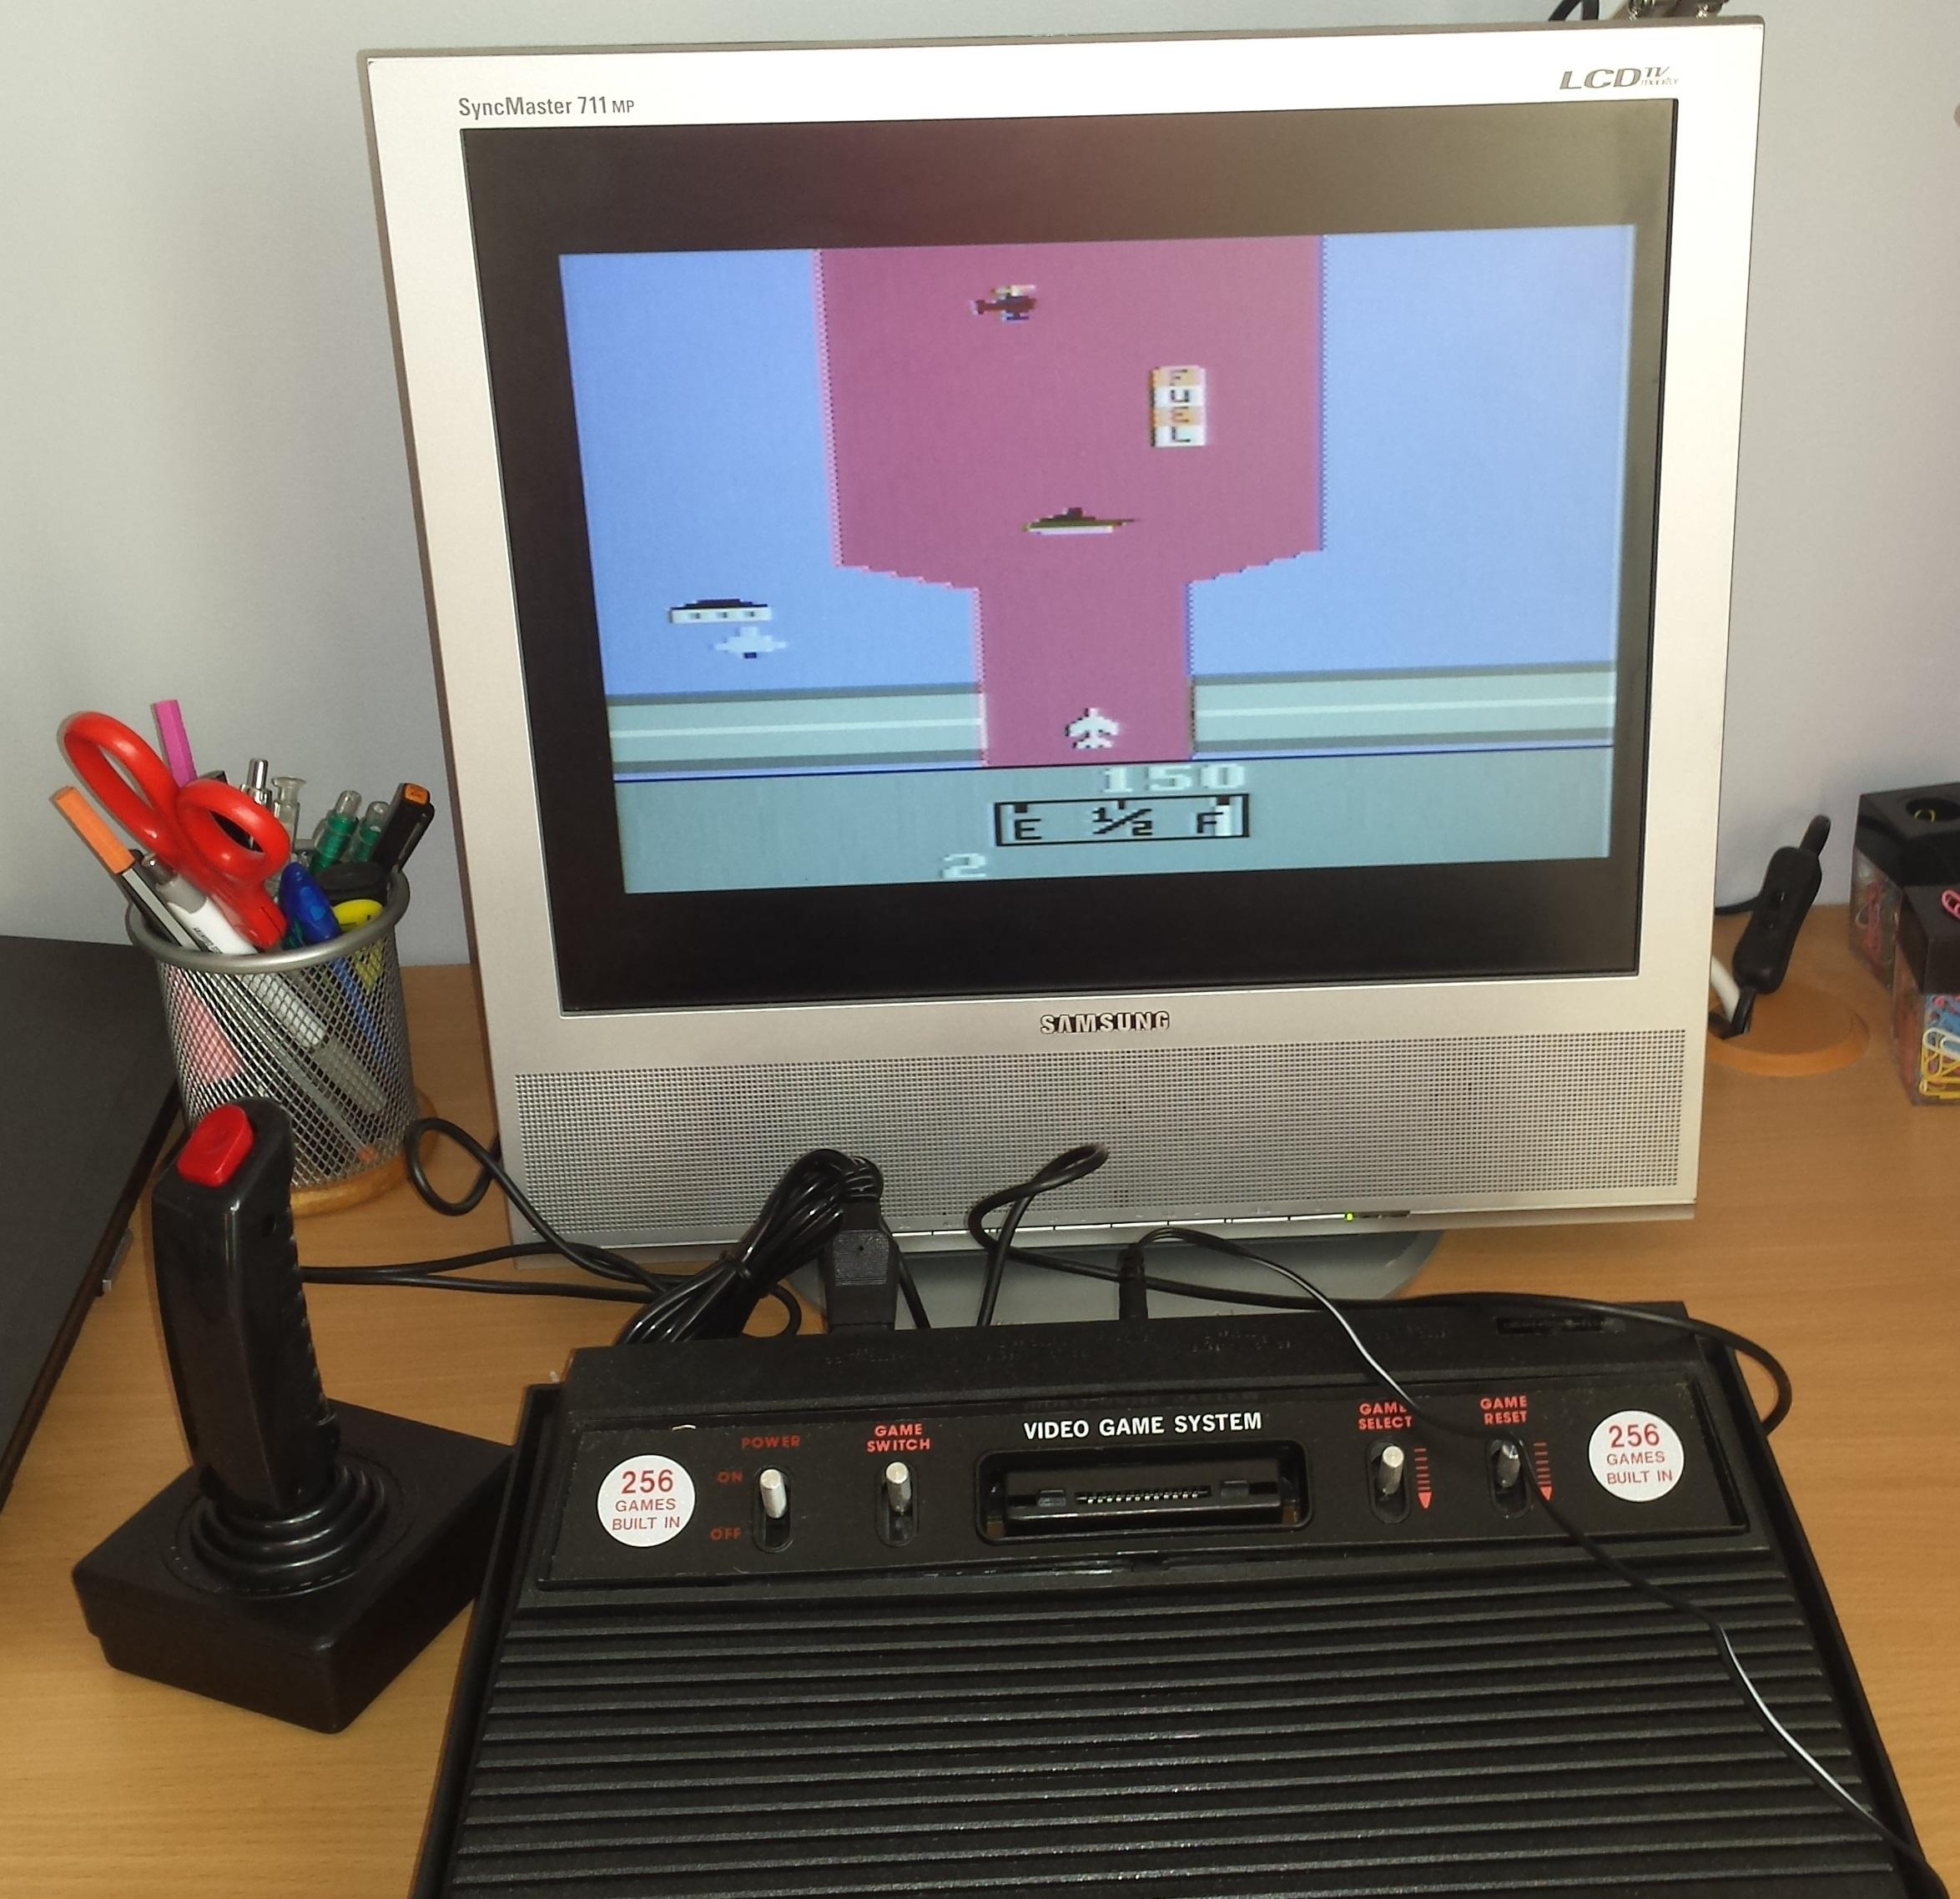 Atari 2600 Rambo 256 gier / nowy / karton /sprawny